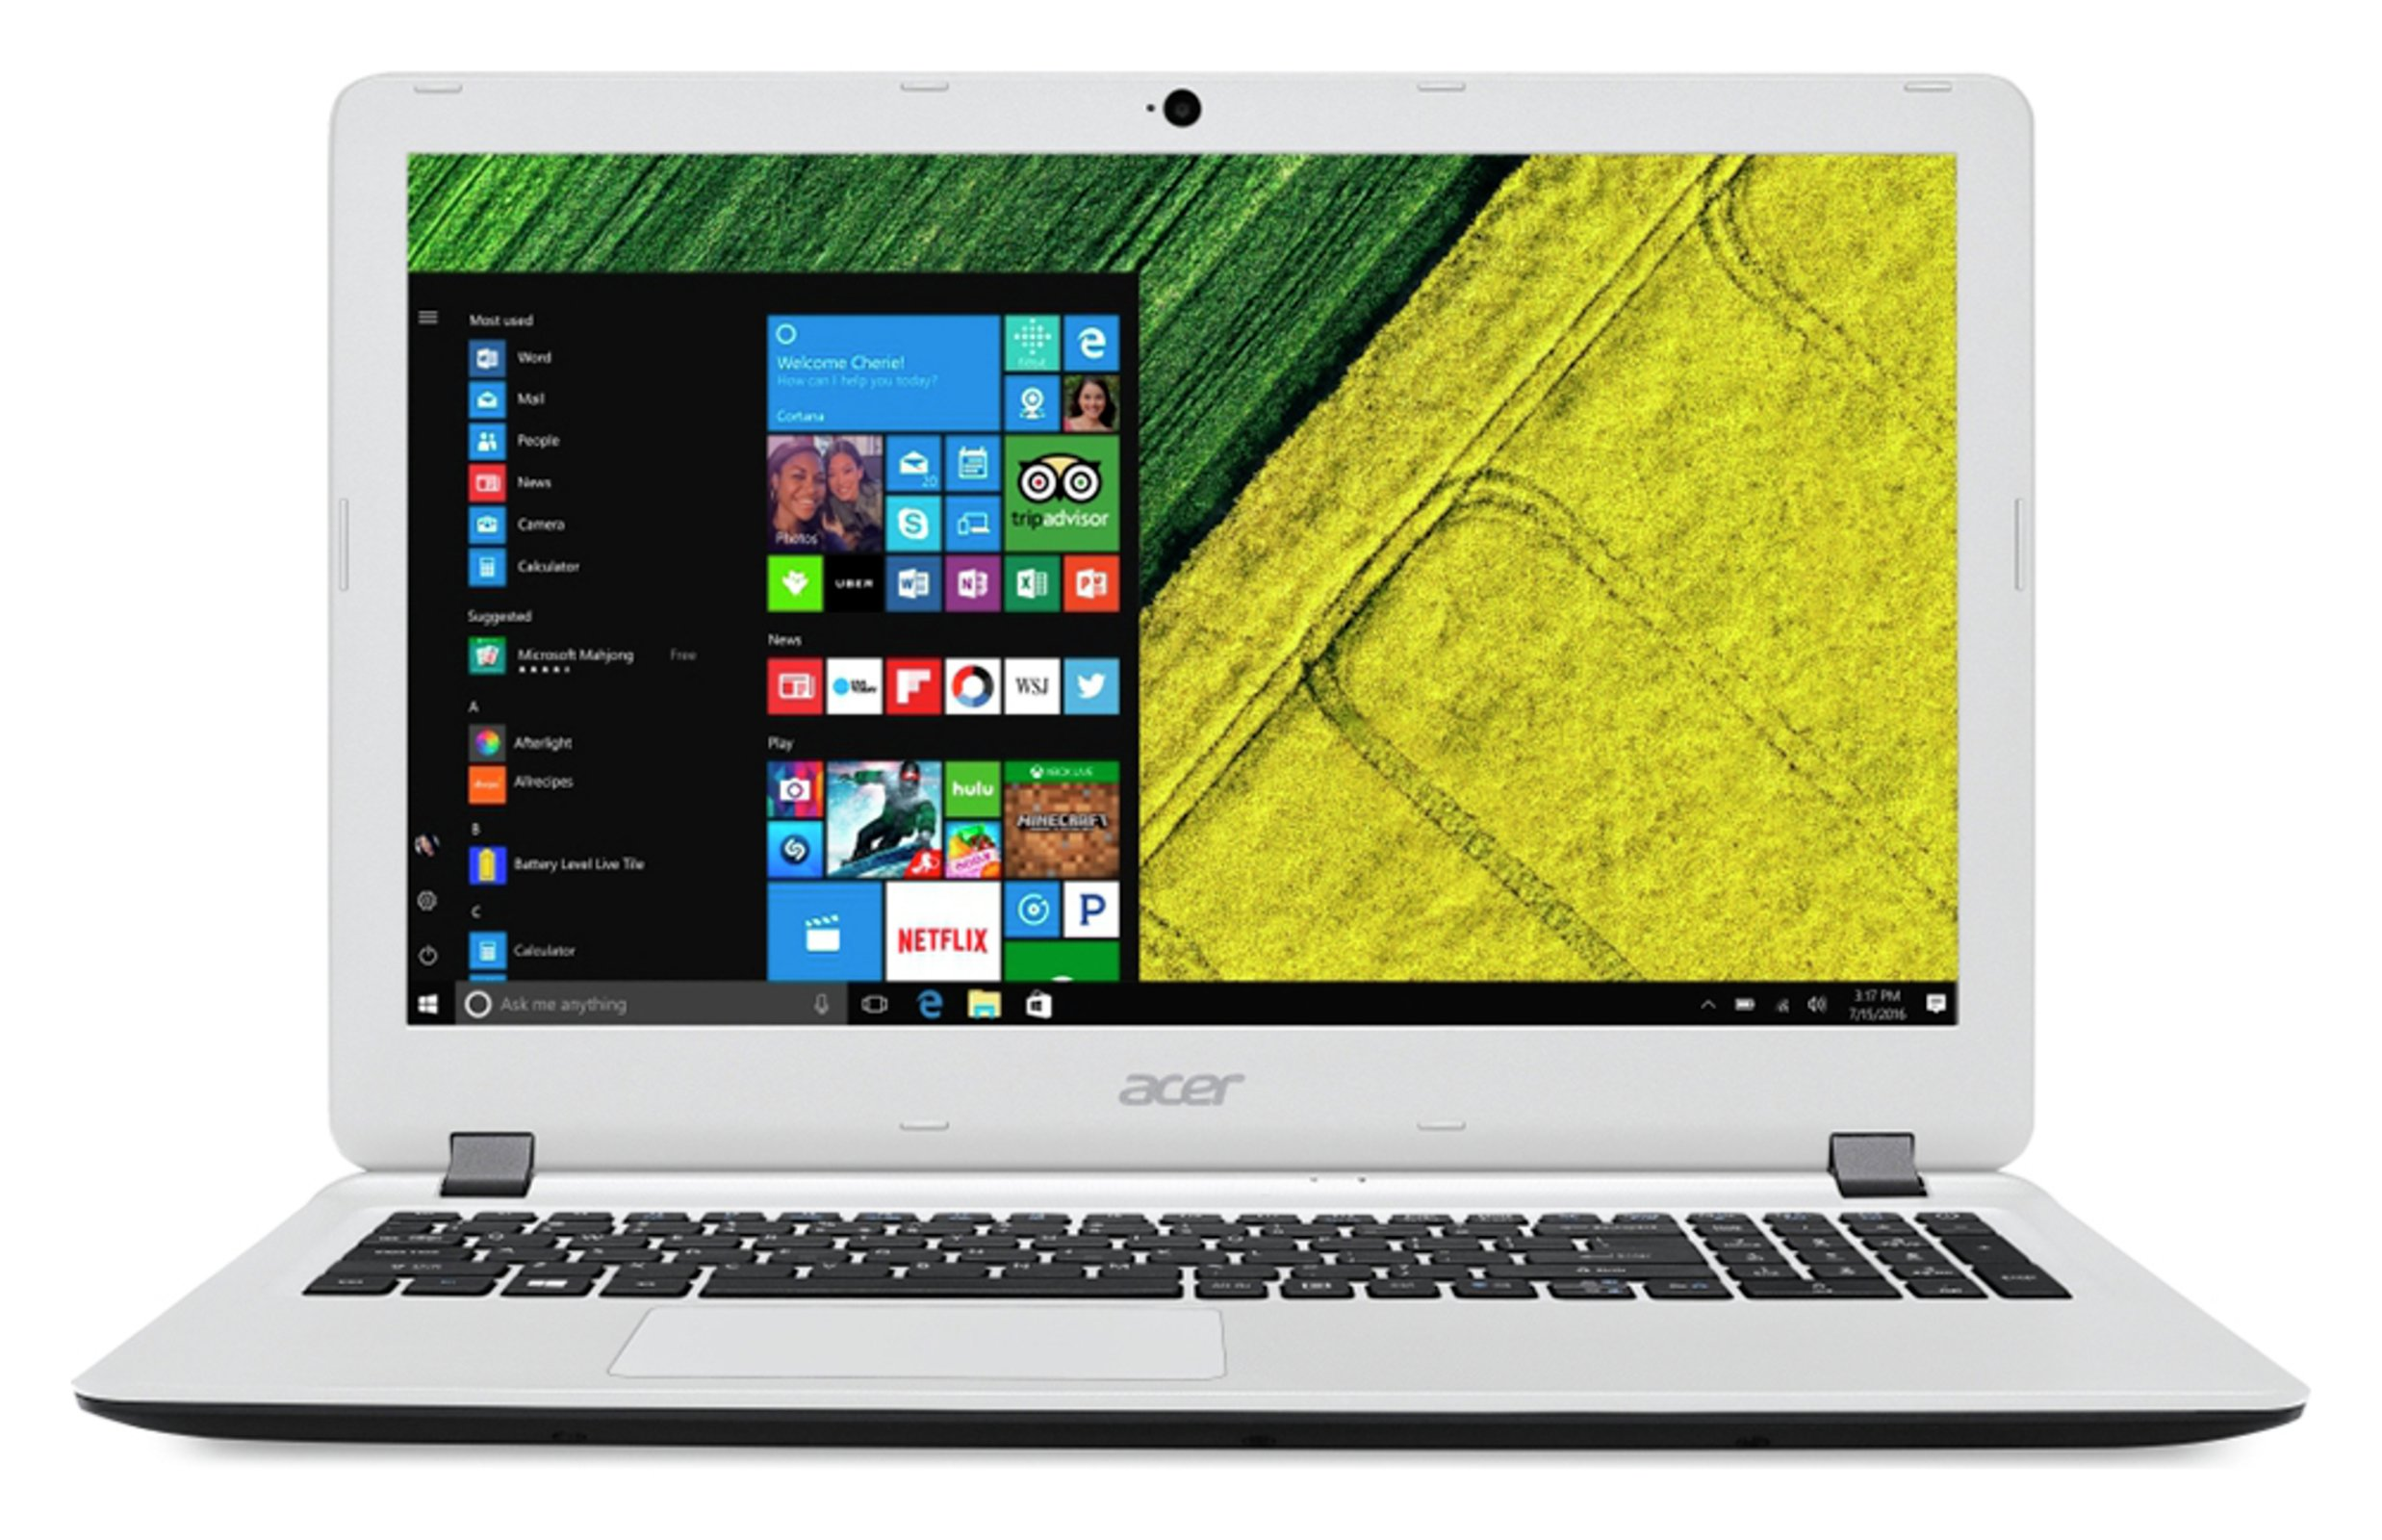 Sale On Acer Aspire Es1 533 15 6 Inch Celeron 8gb 1tb